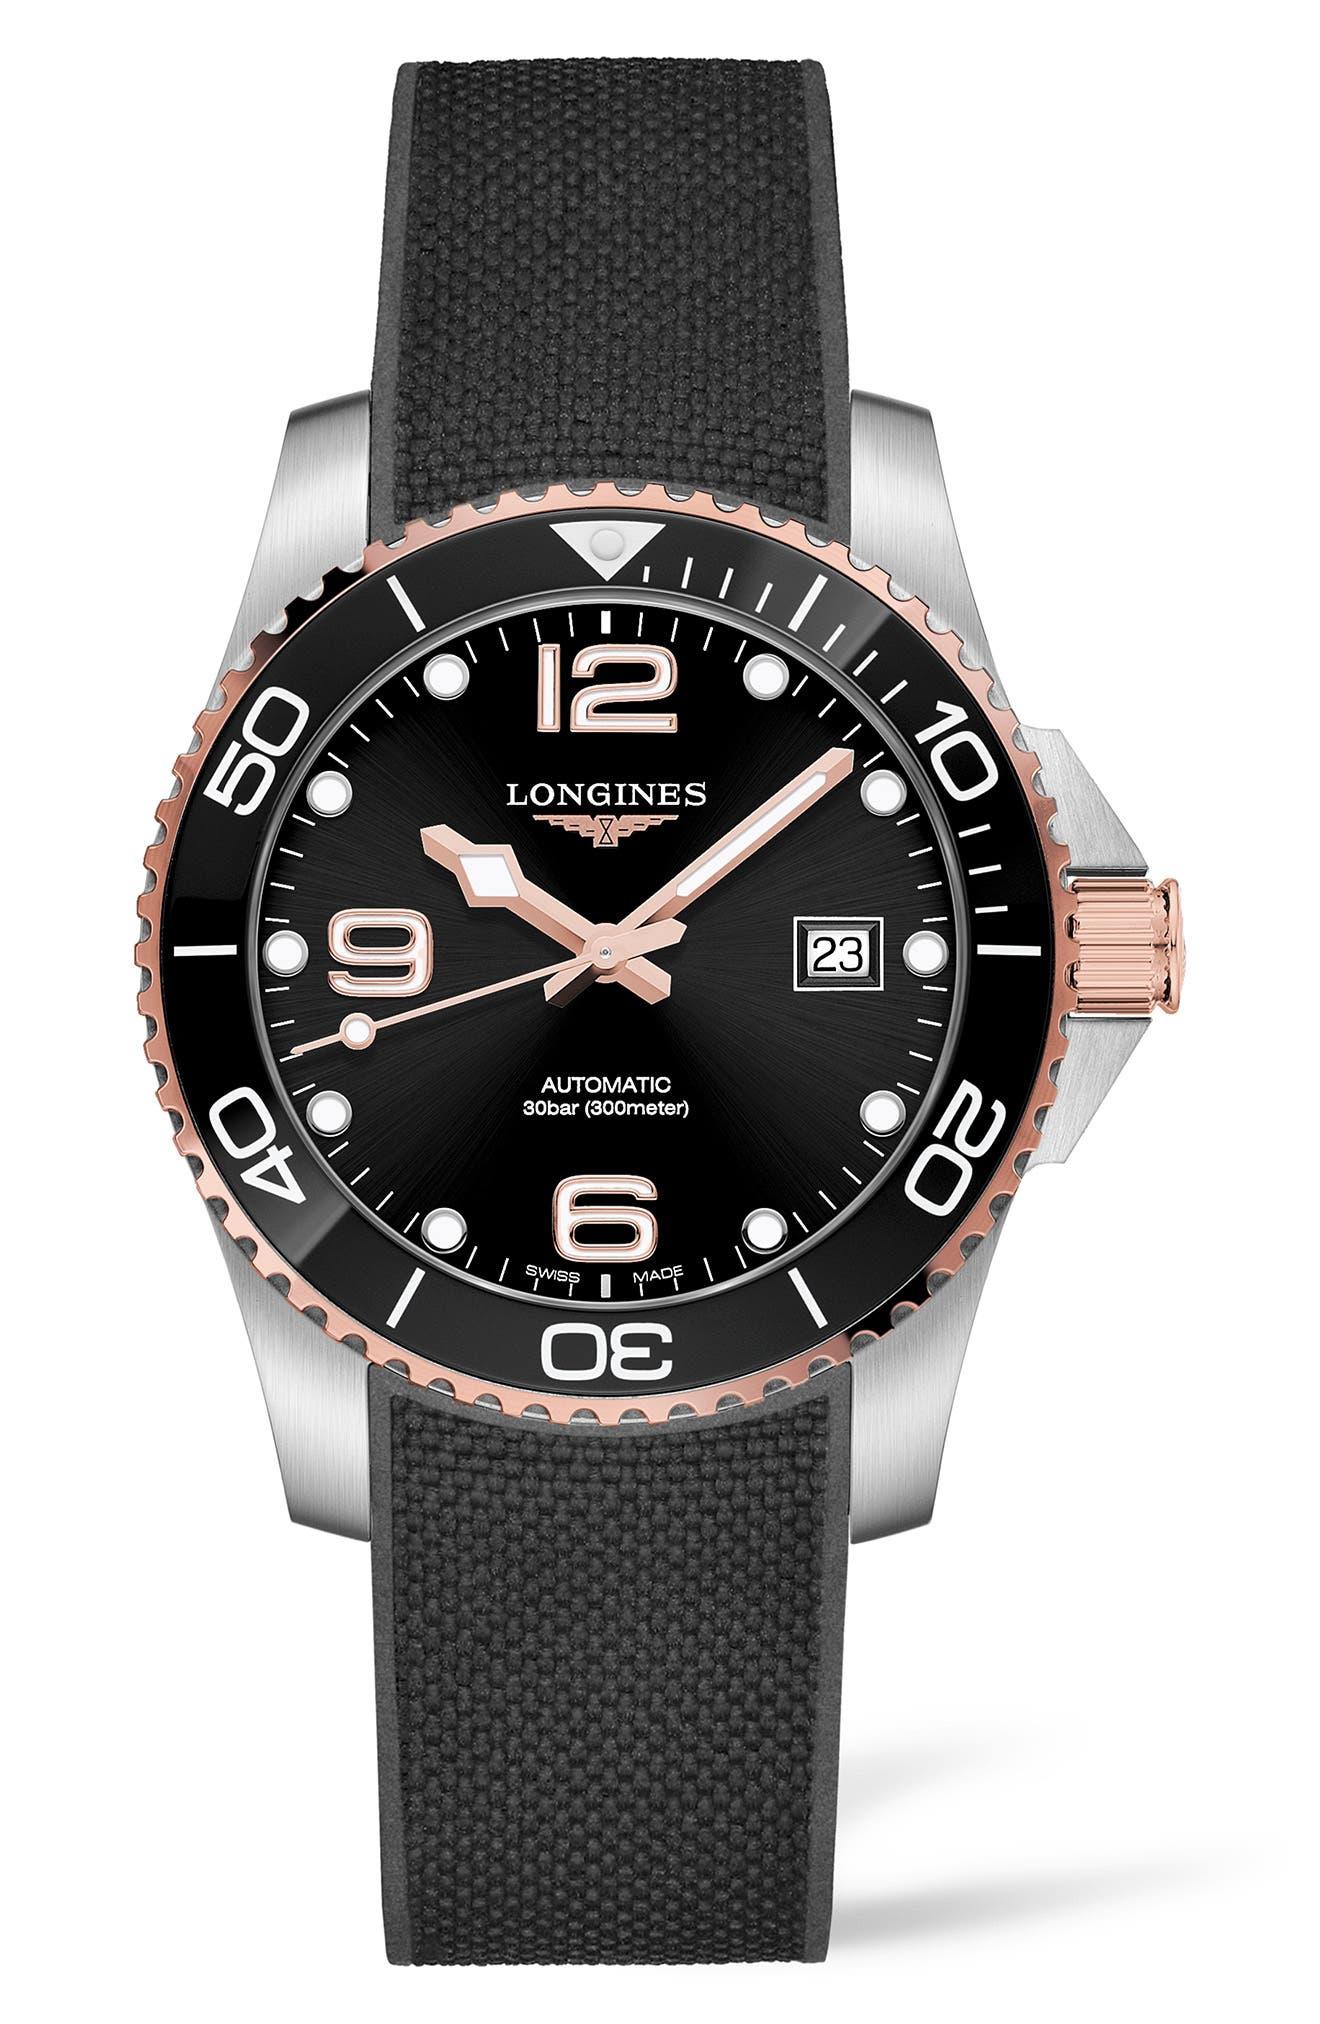 Hydroconquest Automatic Textile Strap Watch